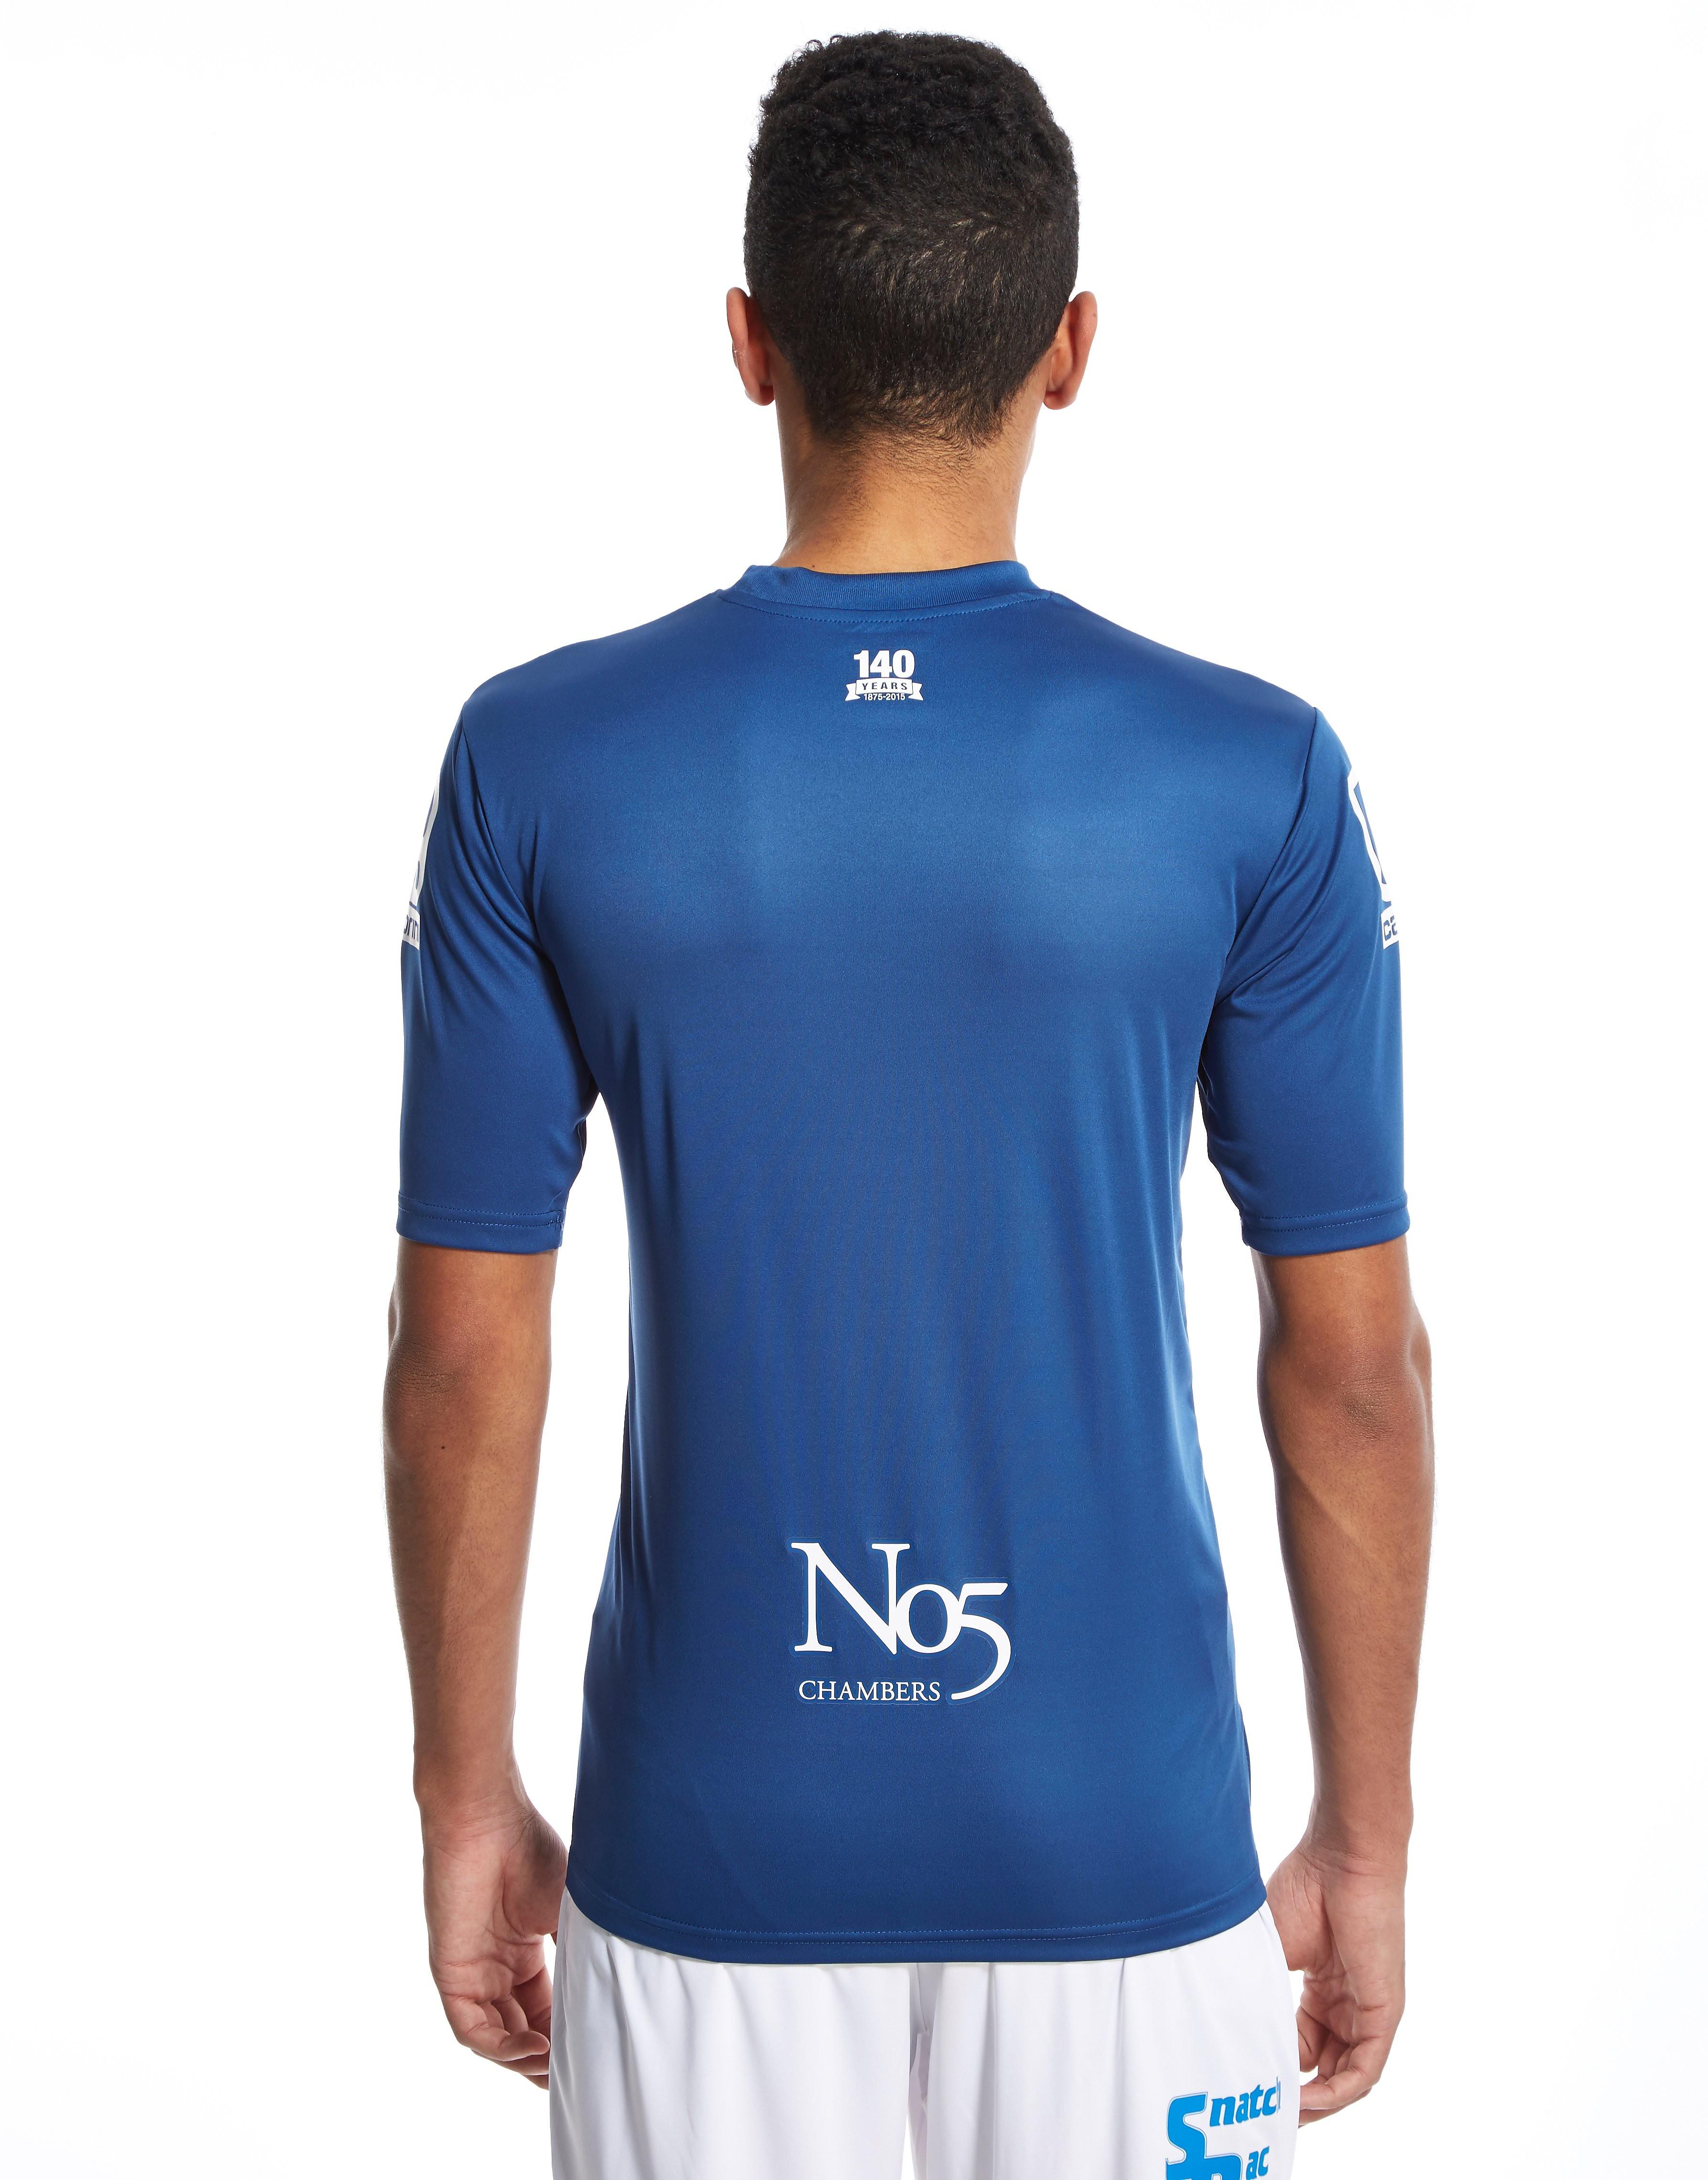 Carbrini Birmingham City FC 2015 Home Shirt